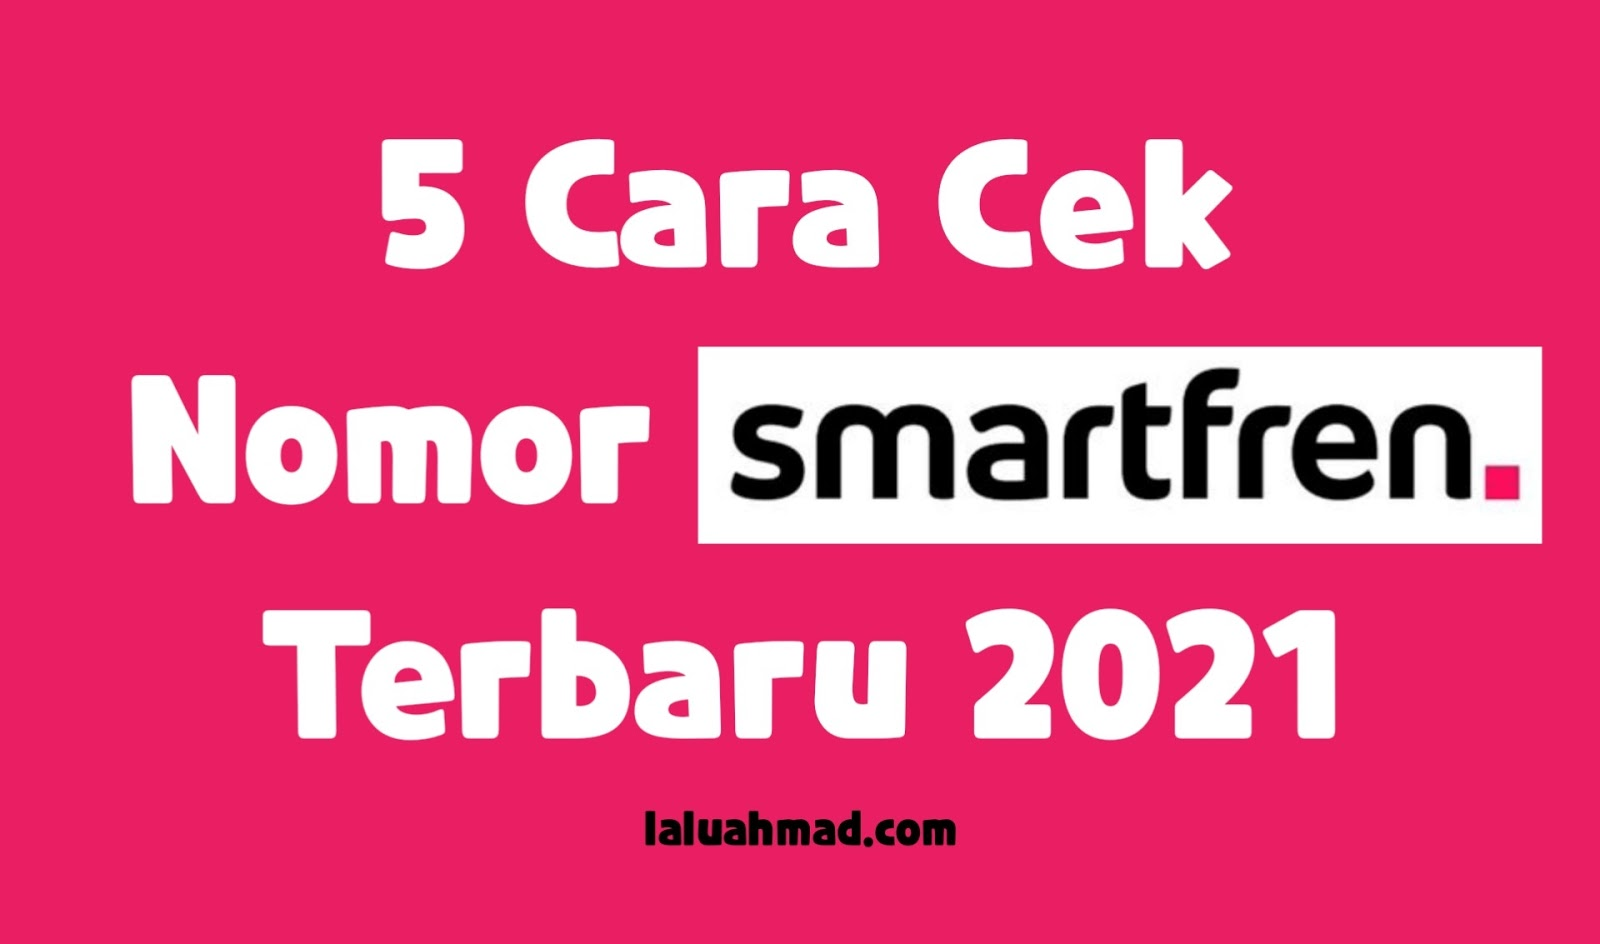 5 Cara Cek Nomor Smartfren Terbaru 2021